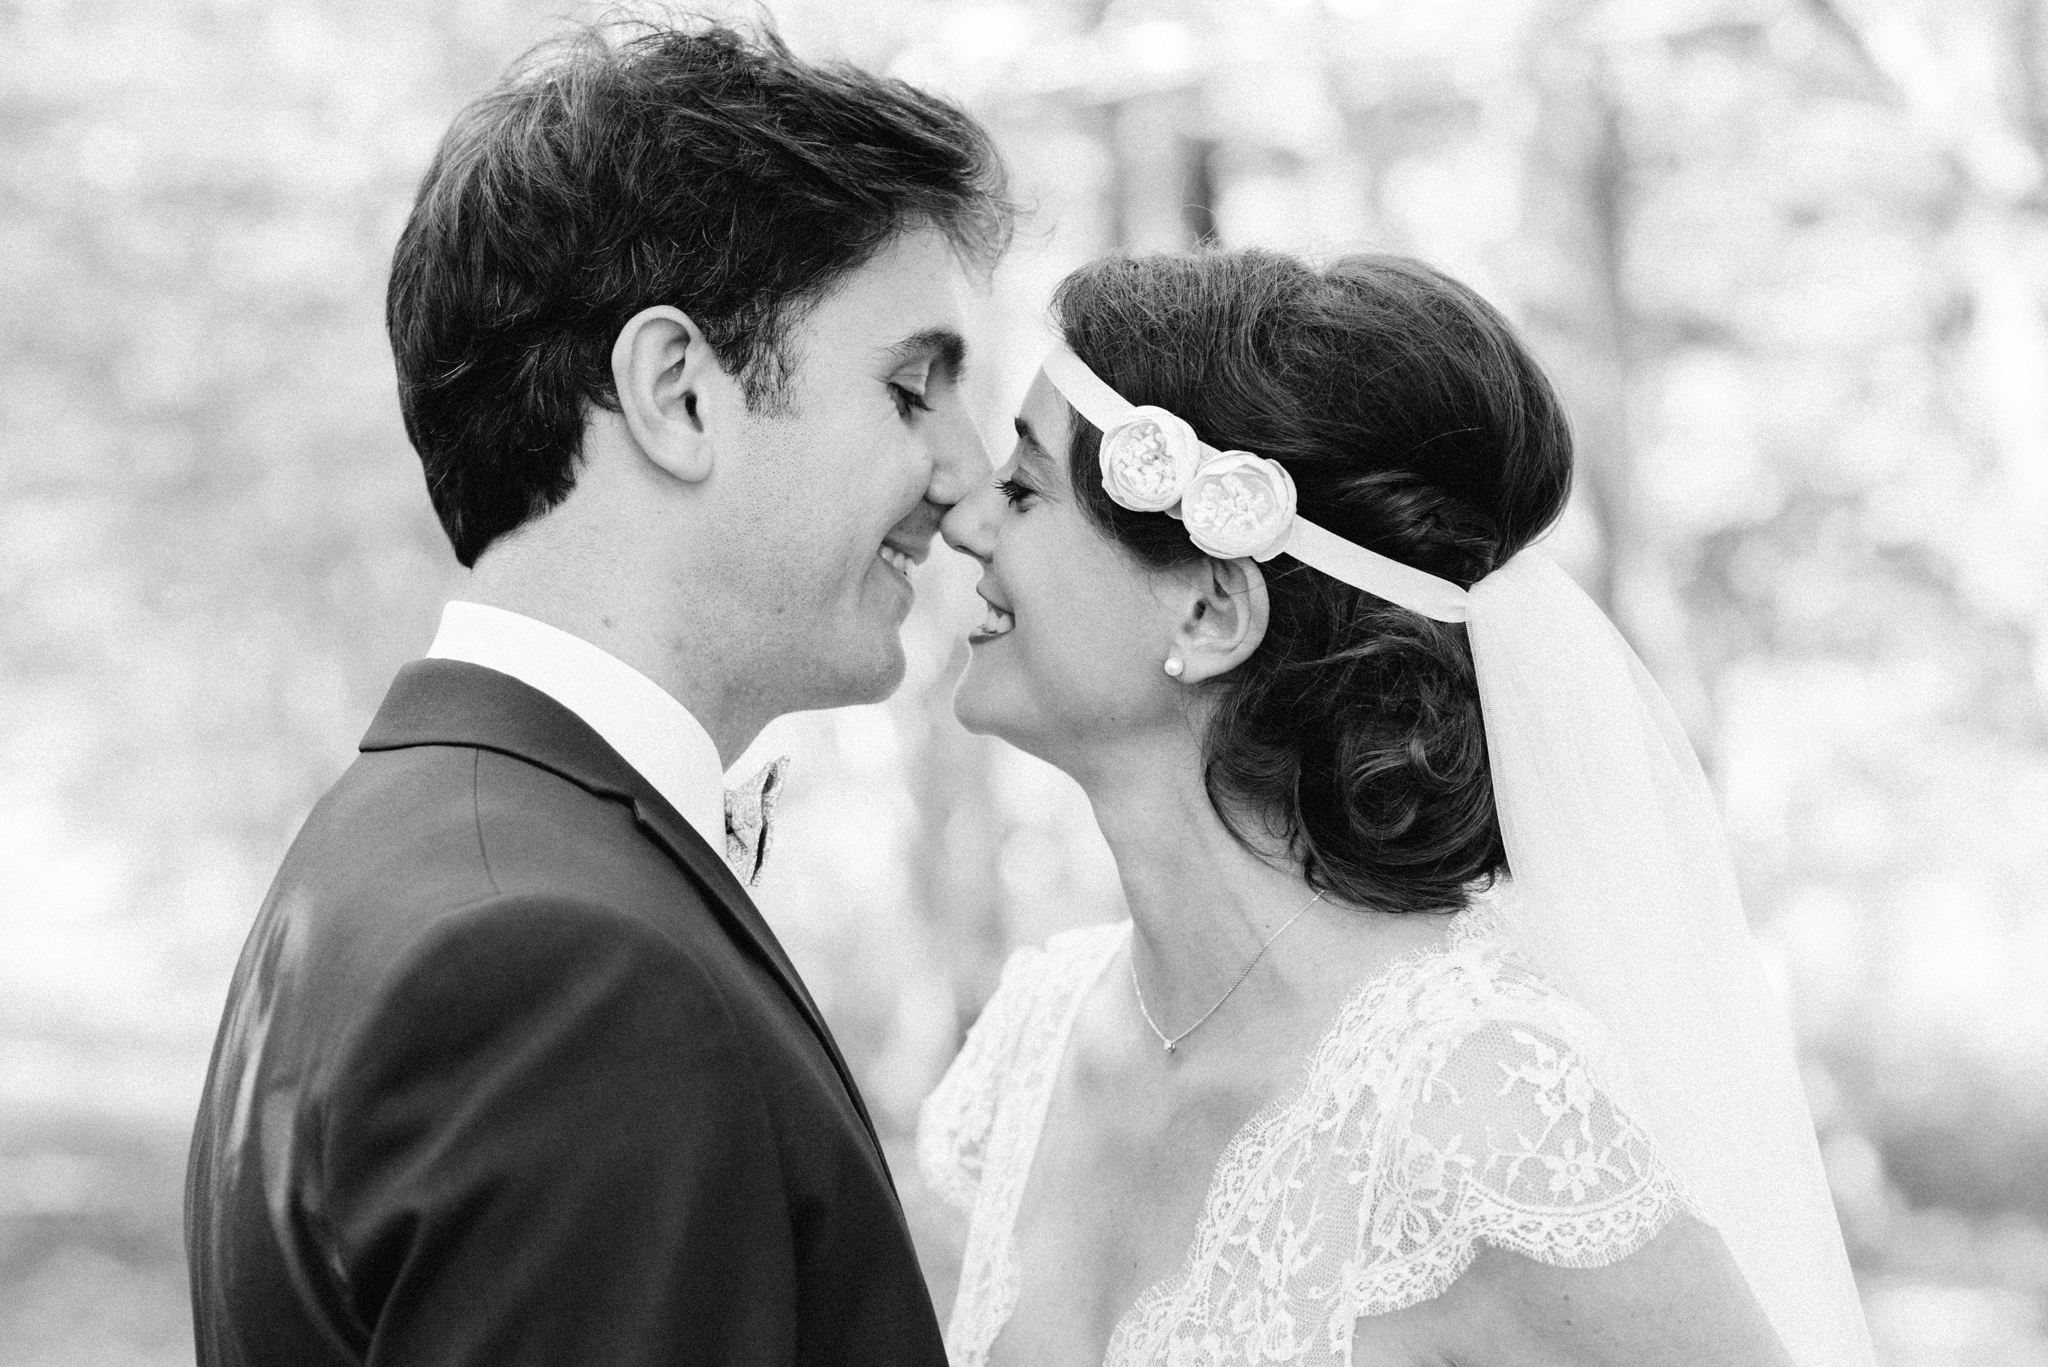 photographe grenoble lyon beaujolais montagne annecy geneve suisse boheme boho wedding photographer wedding chateau villesavin sologne